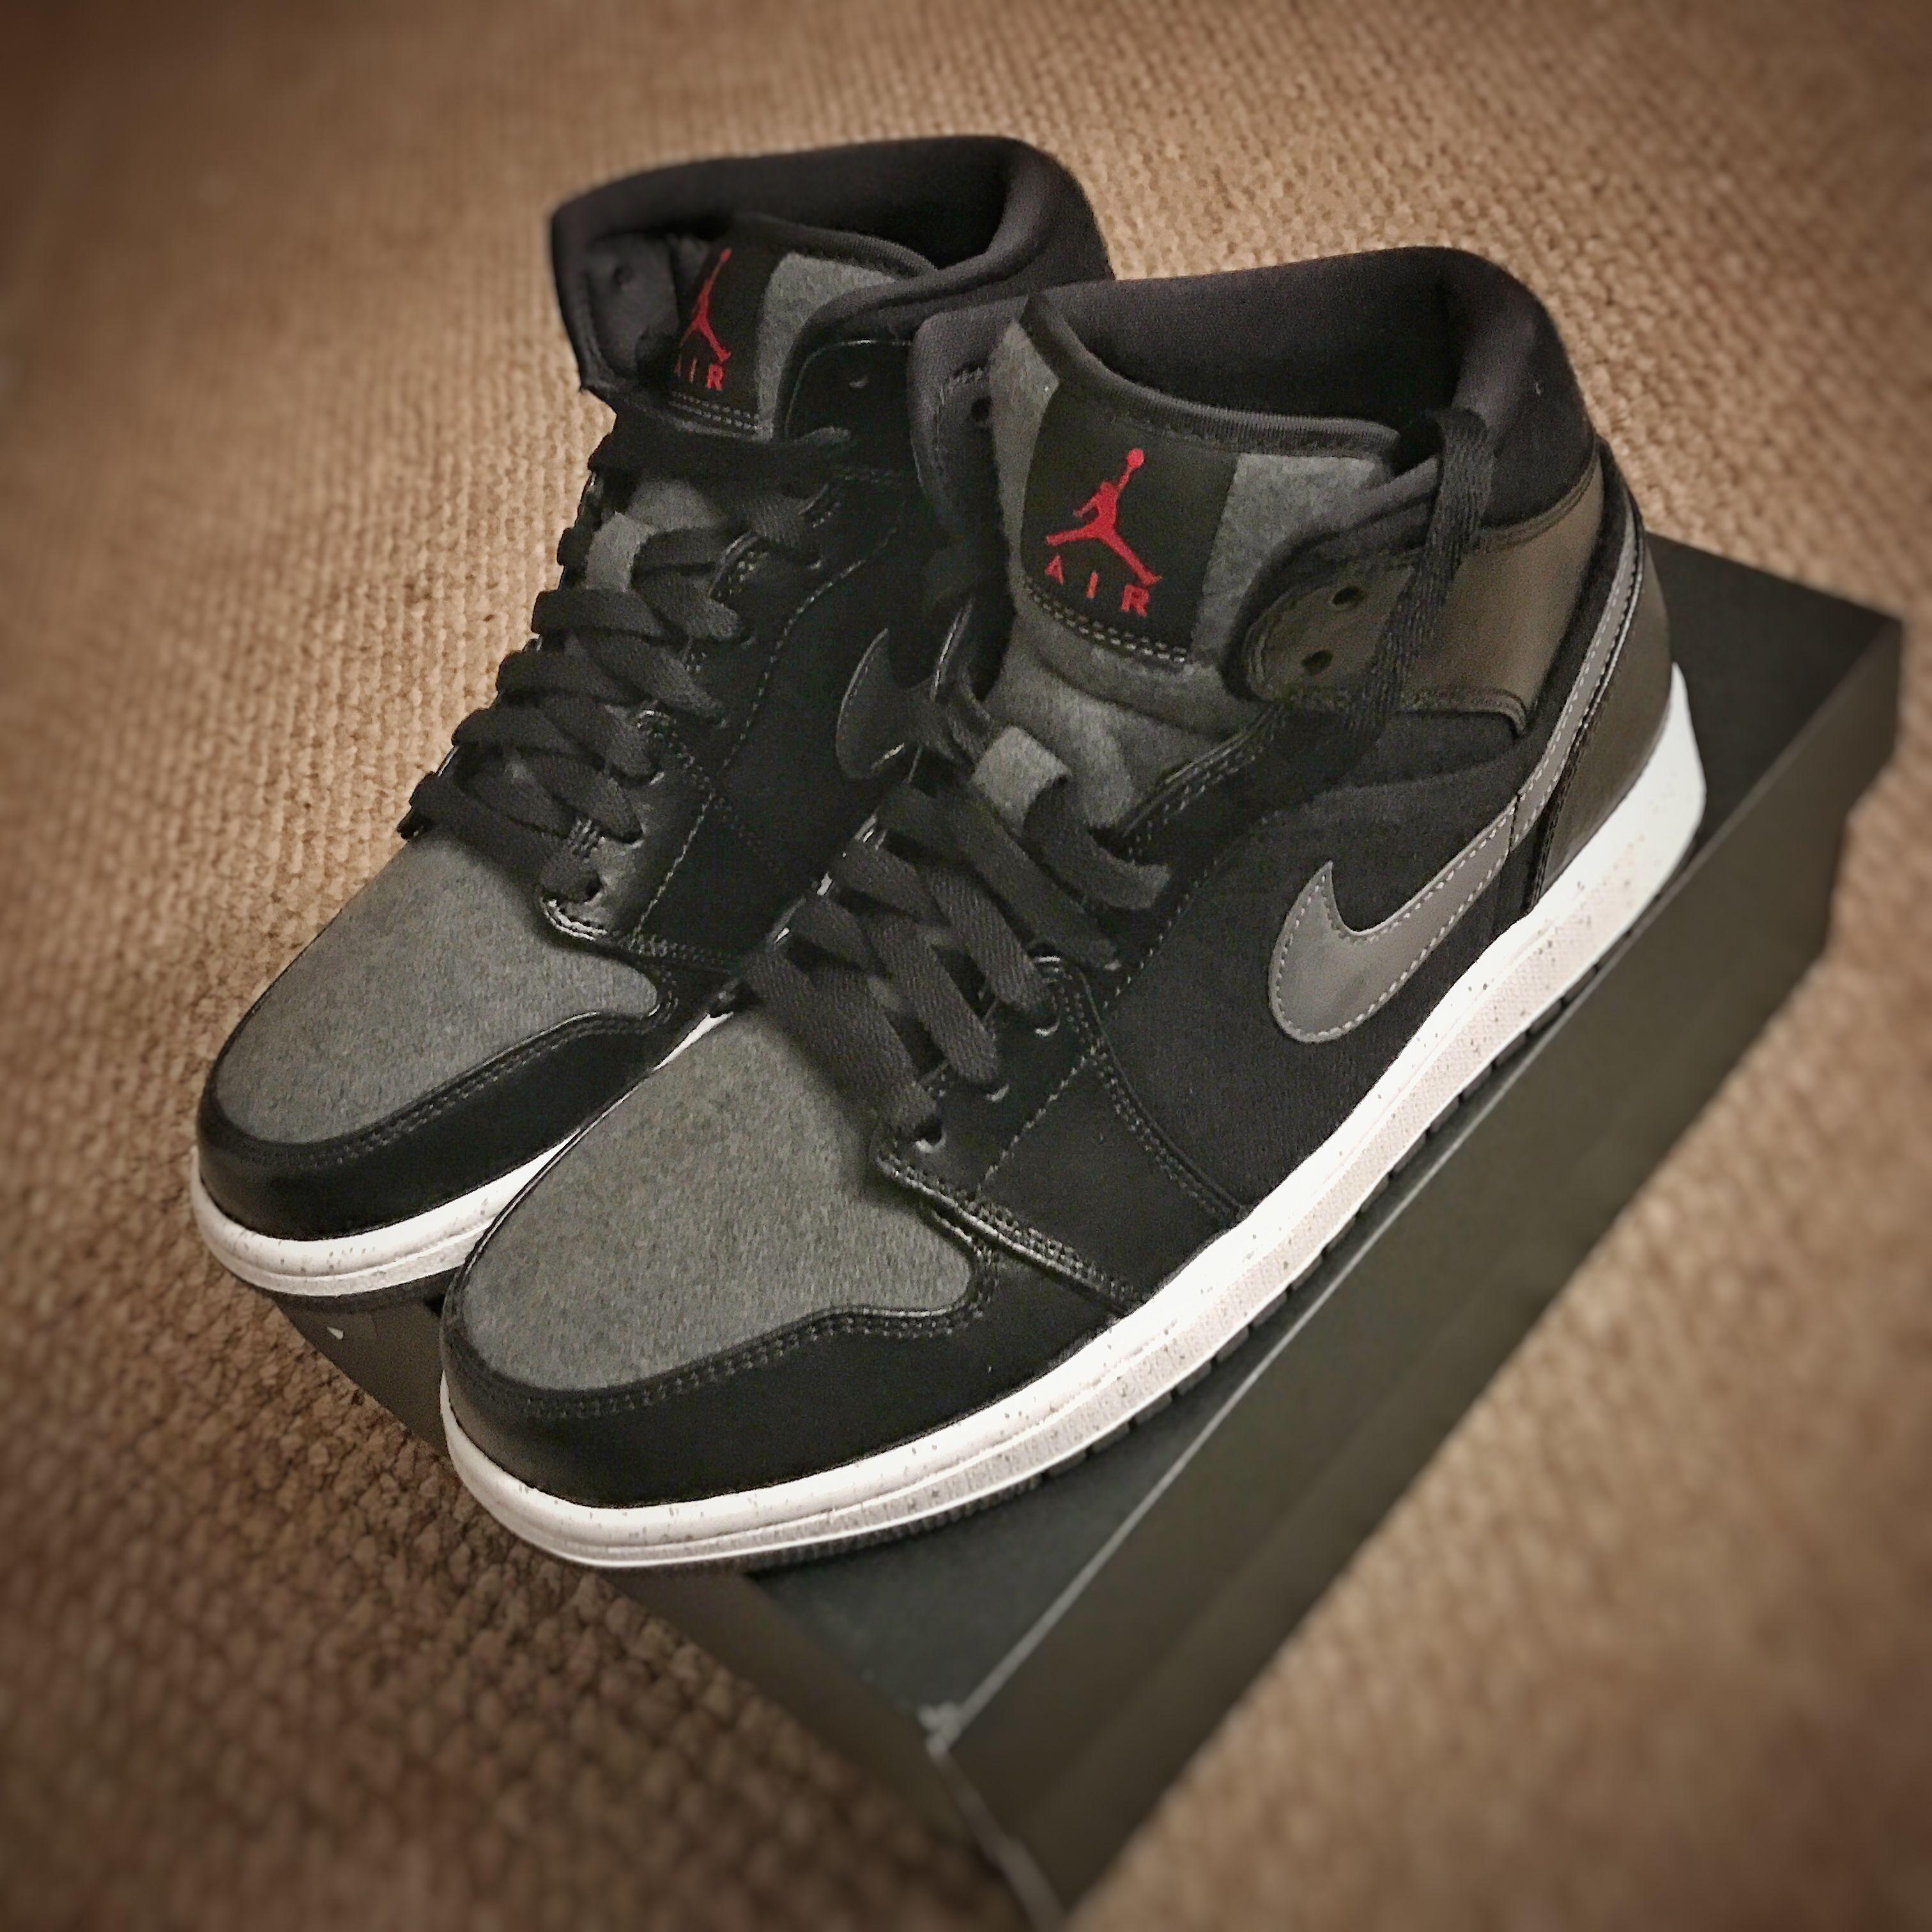 Shoes sneakers jordans, Nike shoes jordans